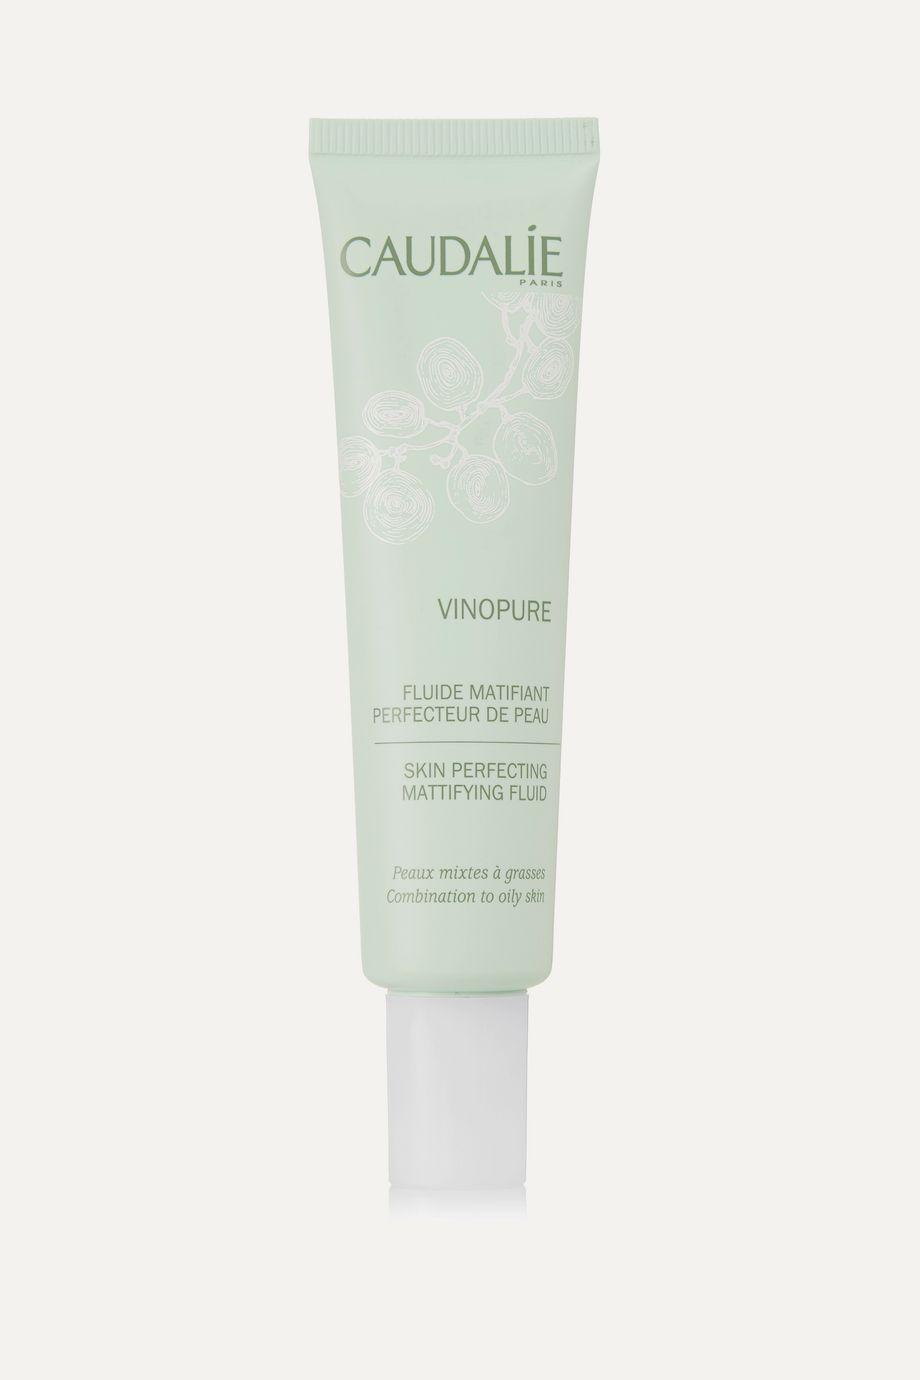 Caudalie Vinopure Skin Perfecting Mattifying Fluid, 40ml